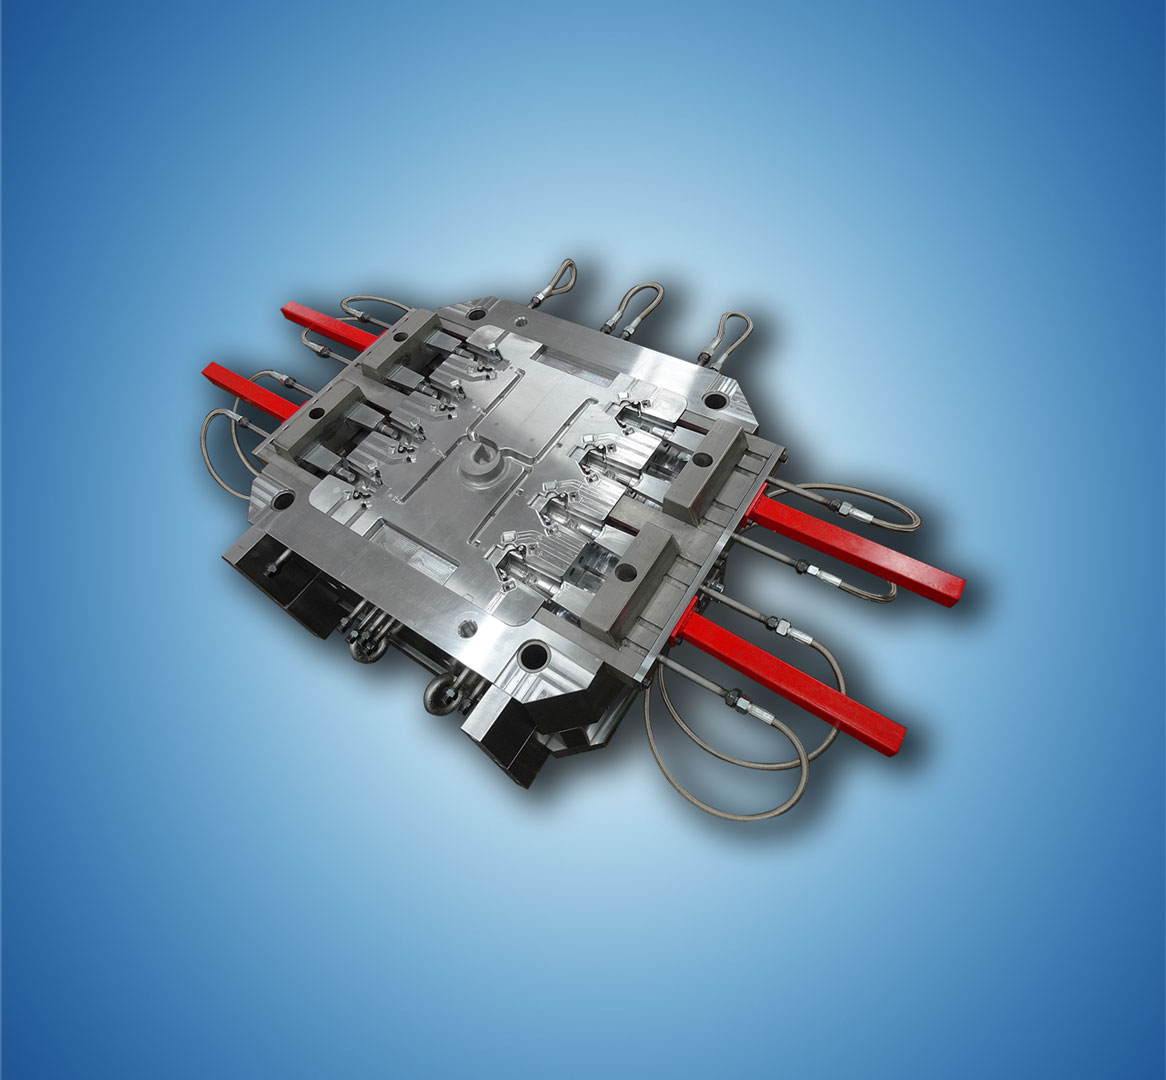 Ero-Projekt-d.o.o.-Toolshop-Werkzeugbau-7-Orodja-za-tlacno-litje-_-slika-2